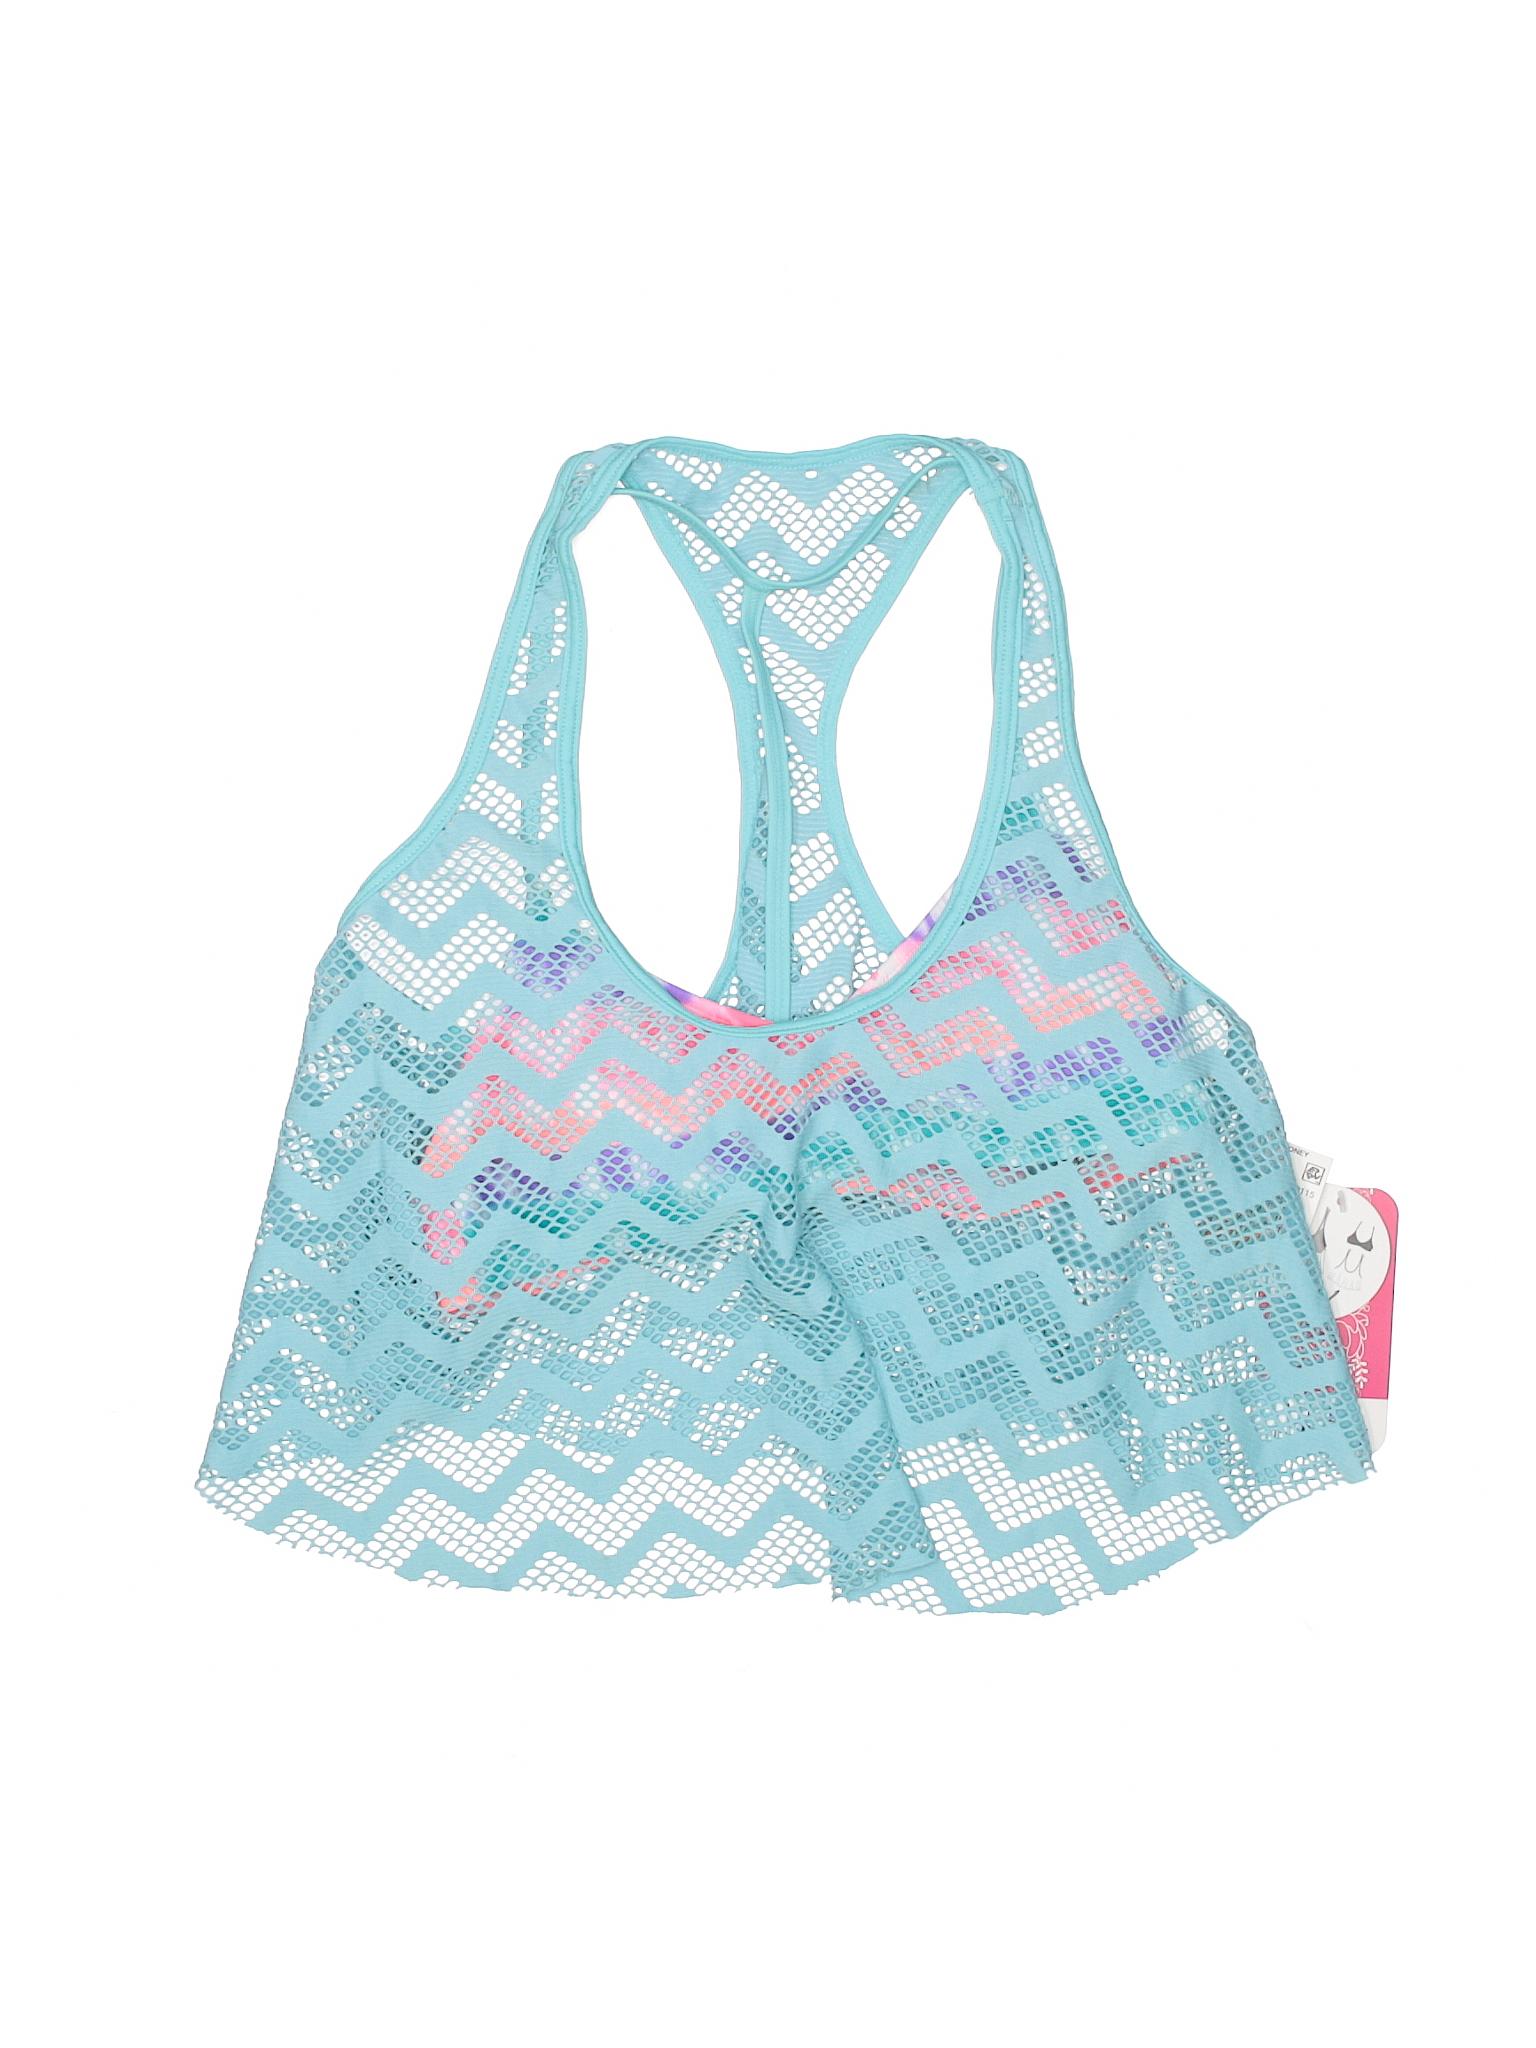 Hula Swimsuit Boutique Swimsuit Hula Honey Boutique Hula Top Boutique Top Honey Bw06OqSxgg